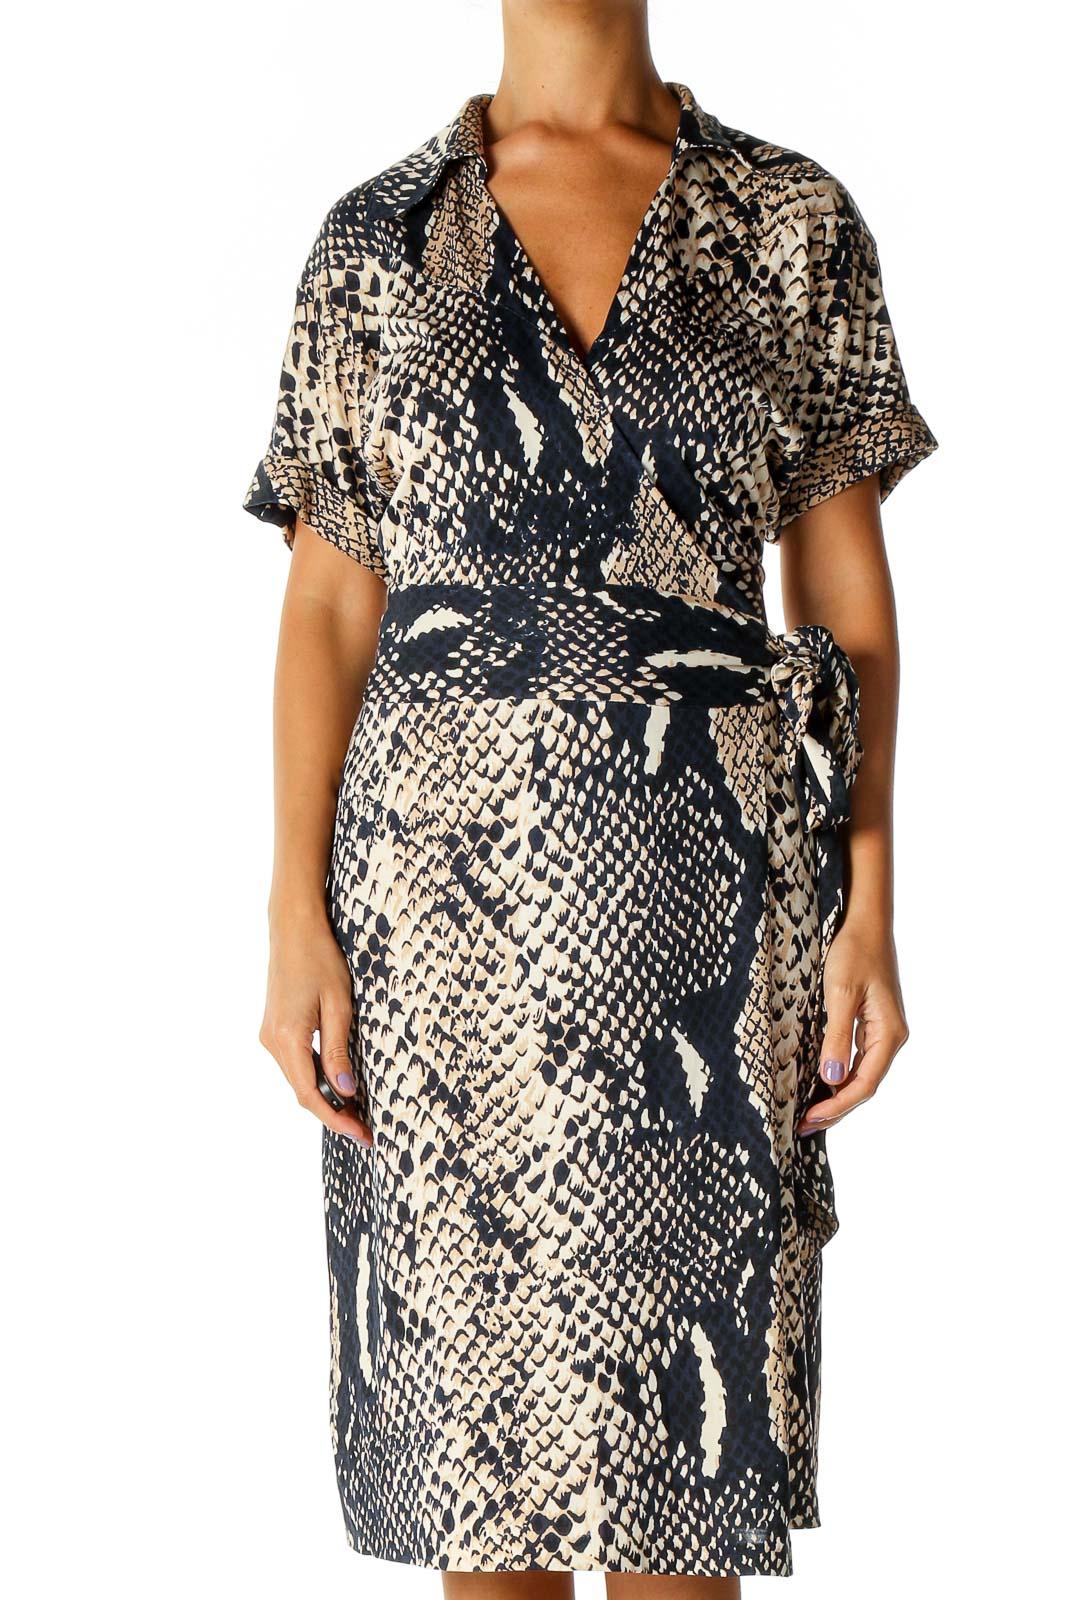 Beige Animal Print Bohemian Sheath Dress Front